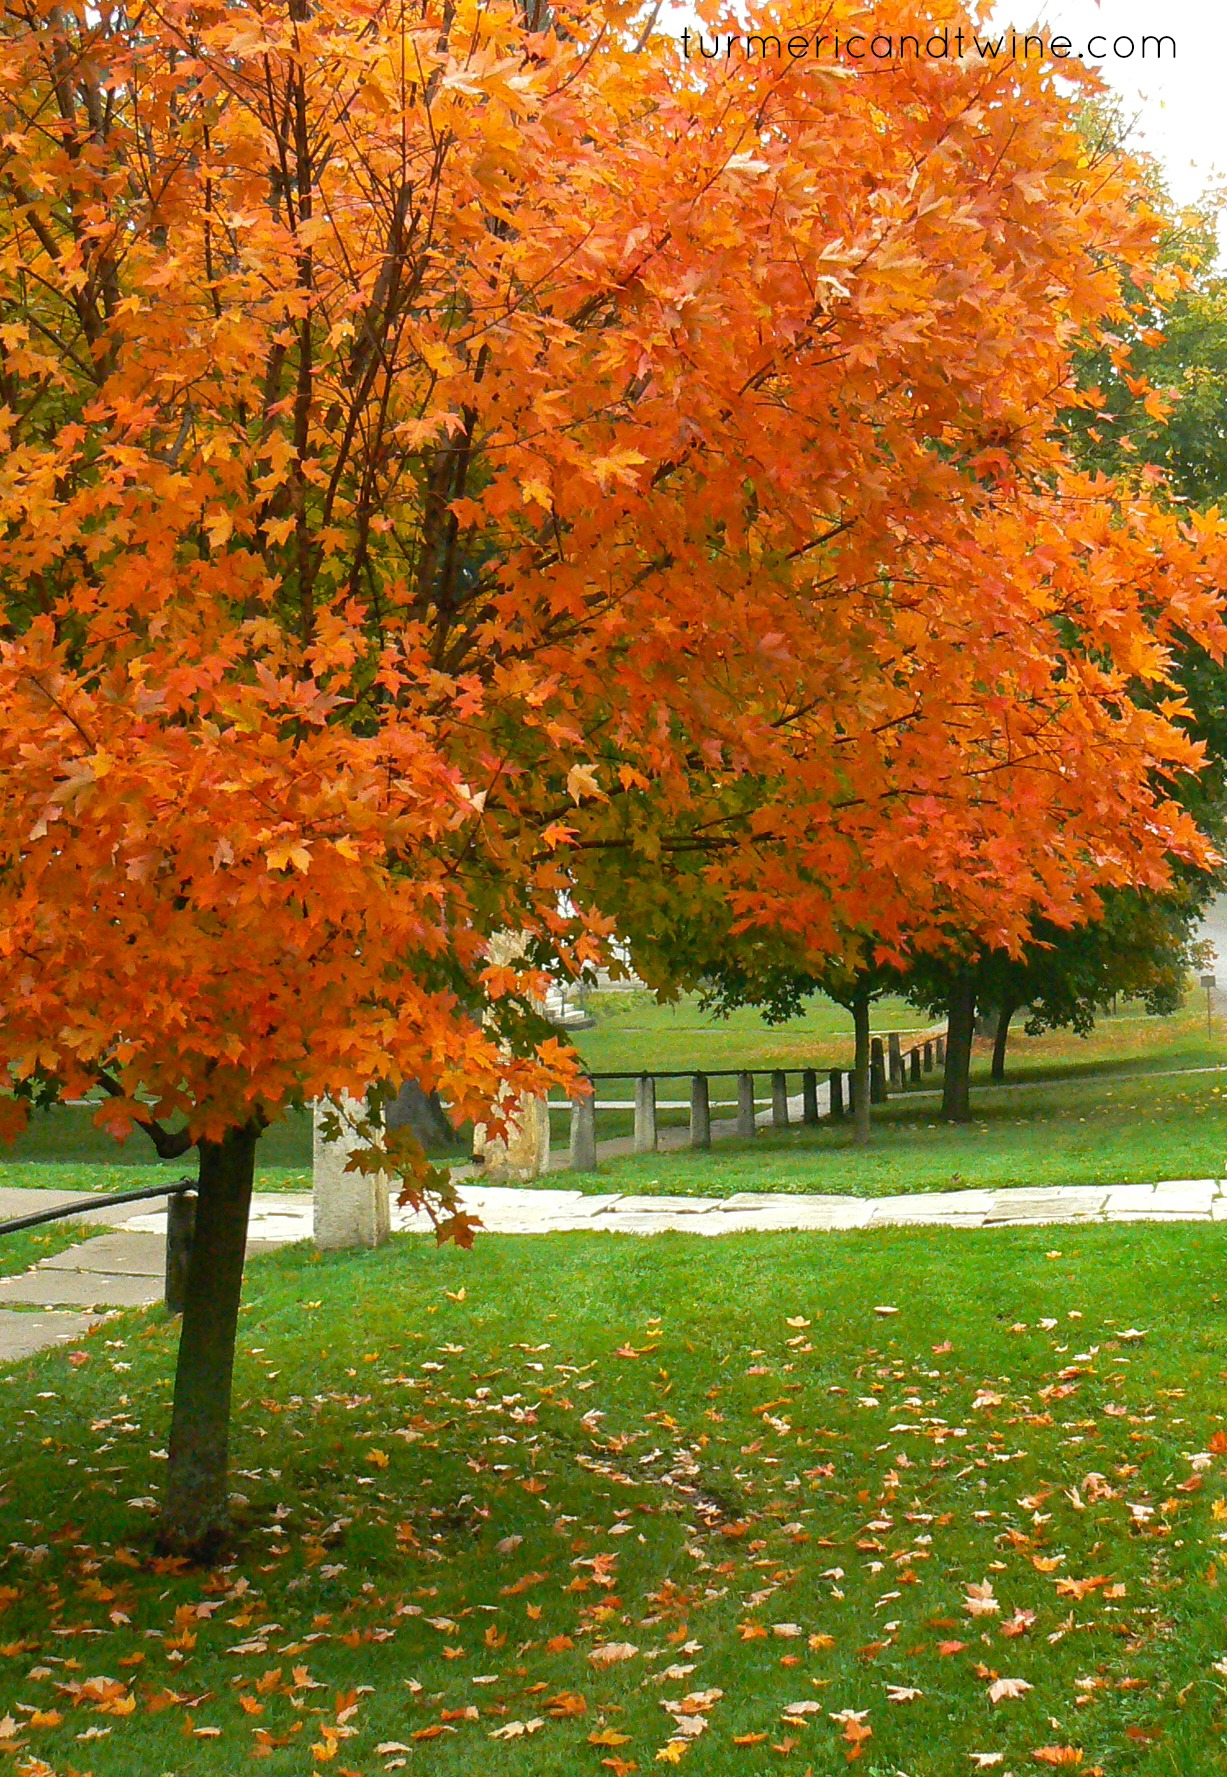 Autumn Colours Turmeric And Twine